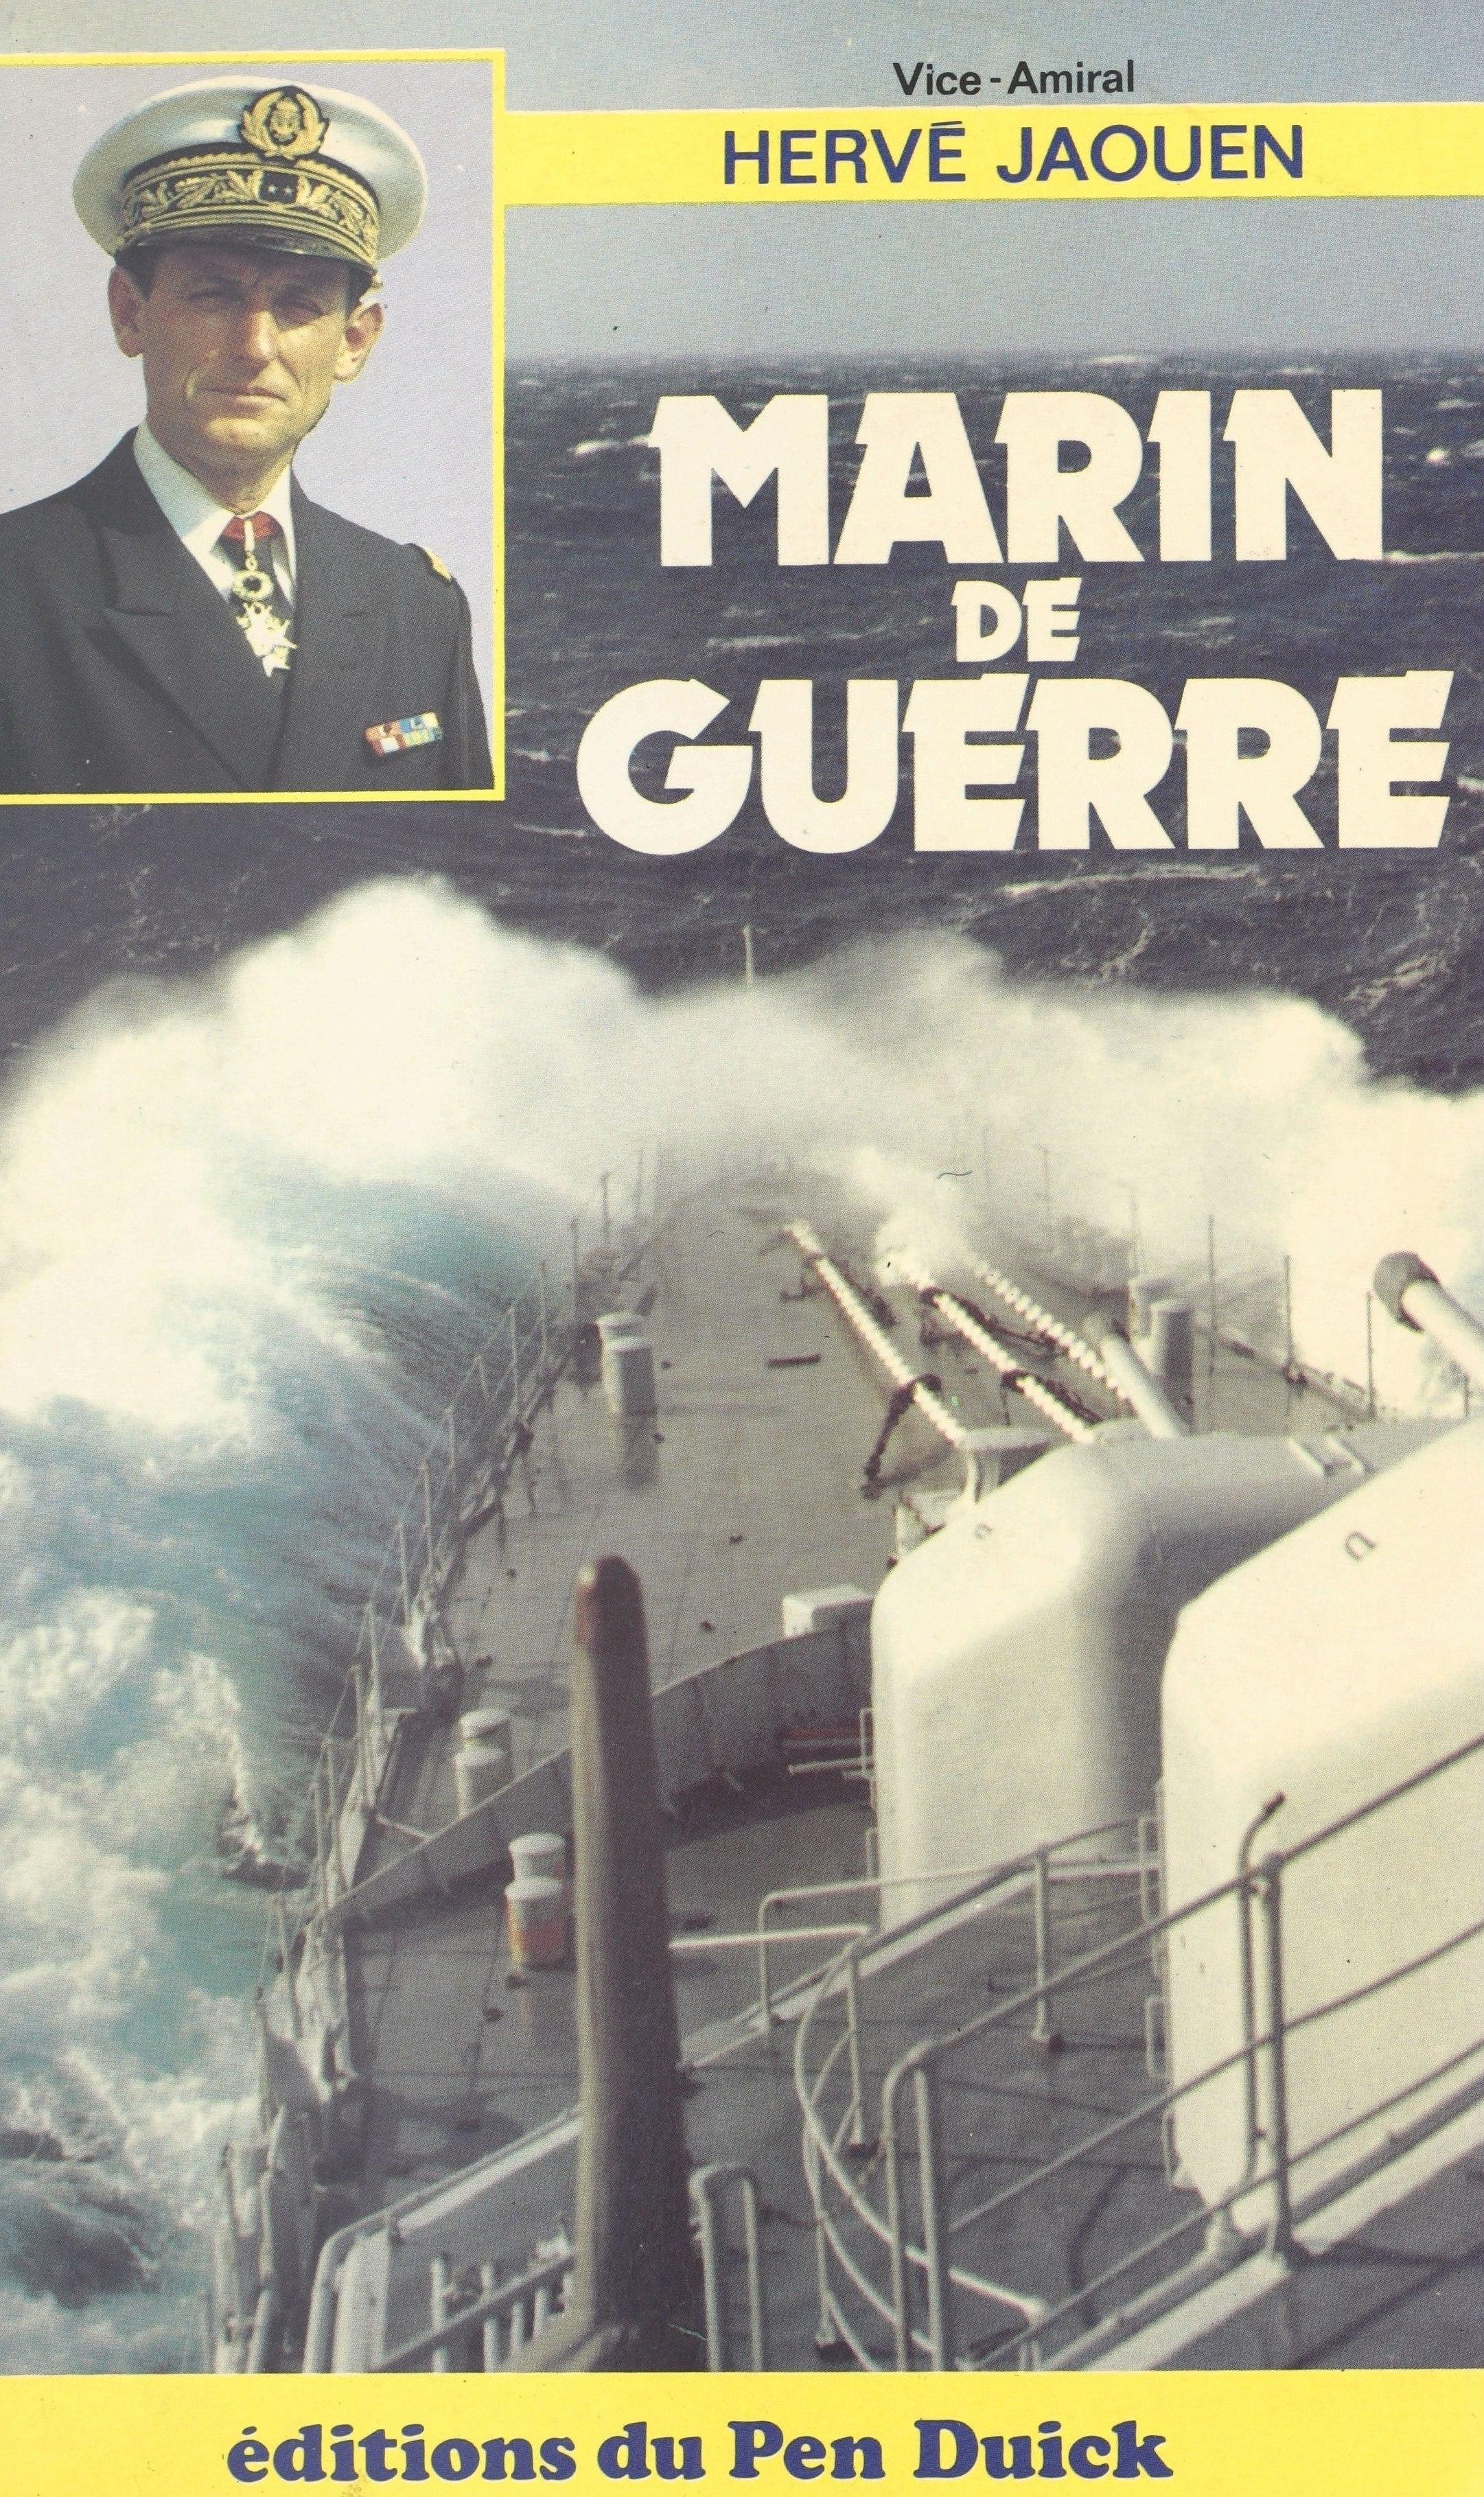 Marin de guerre